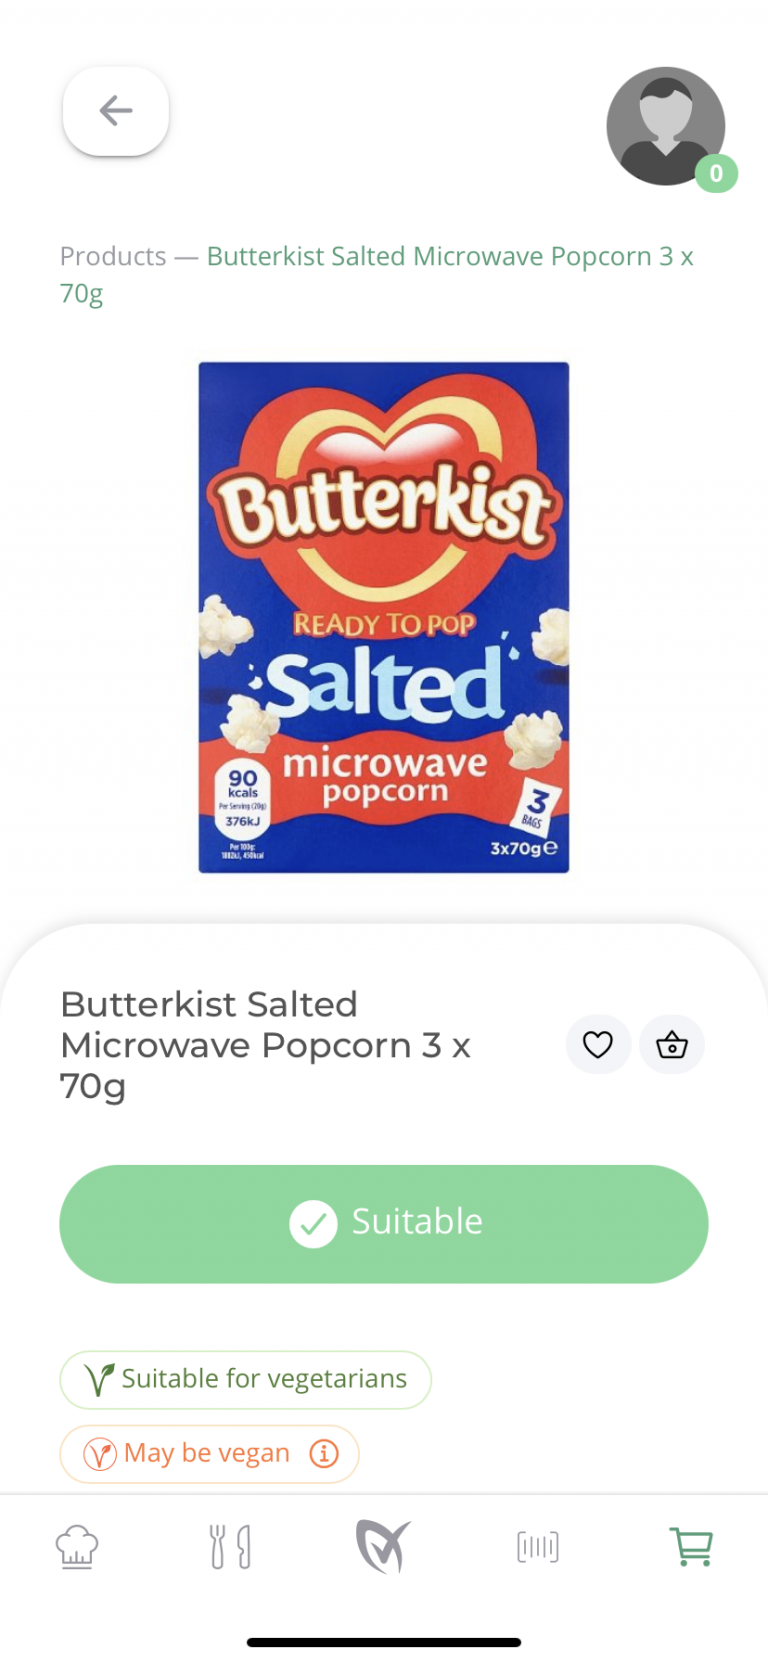 Butterkist salted microwave popcorn